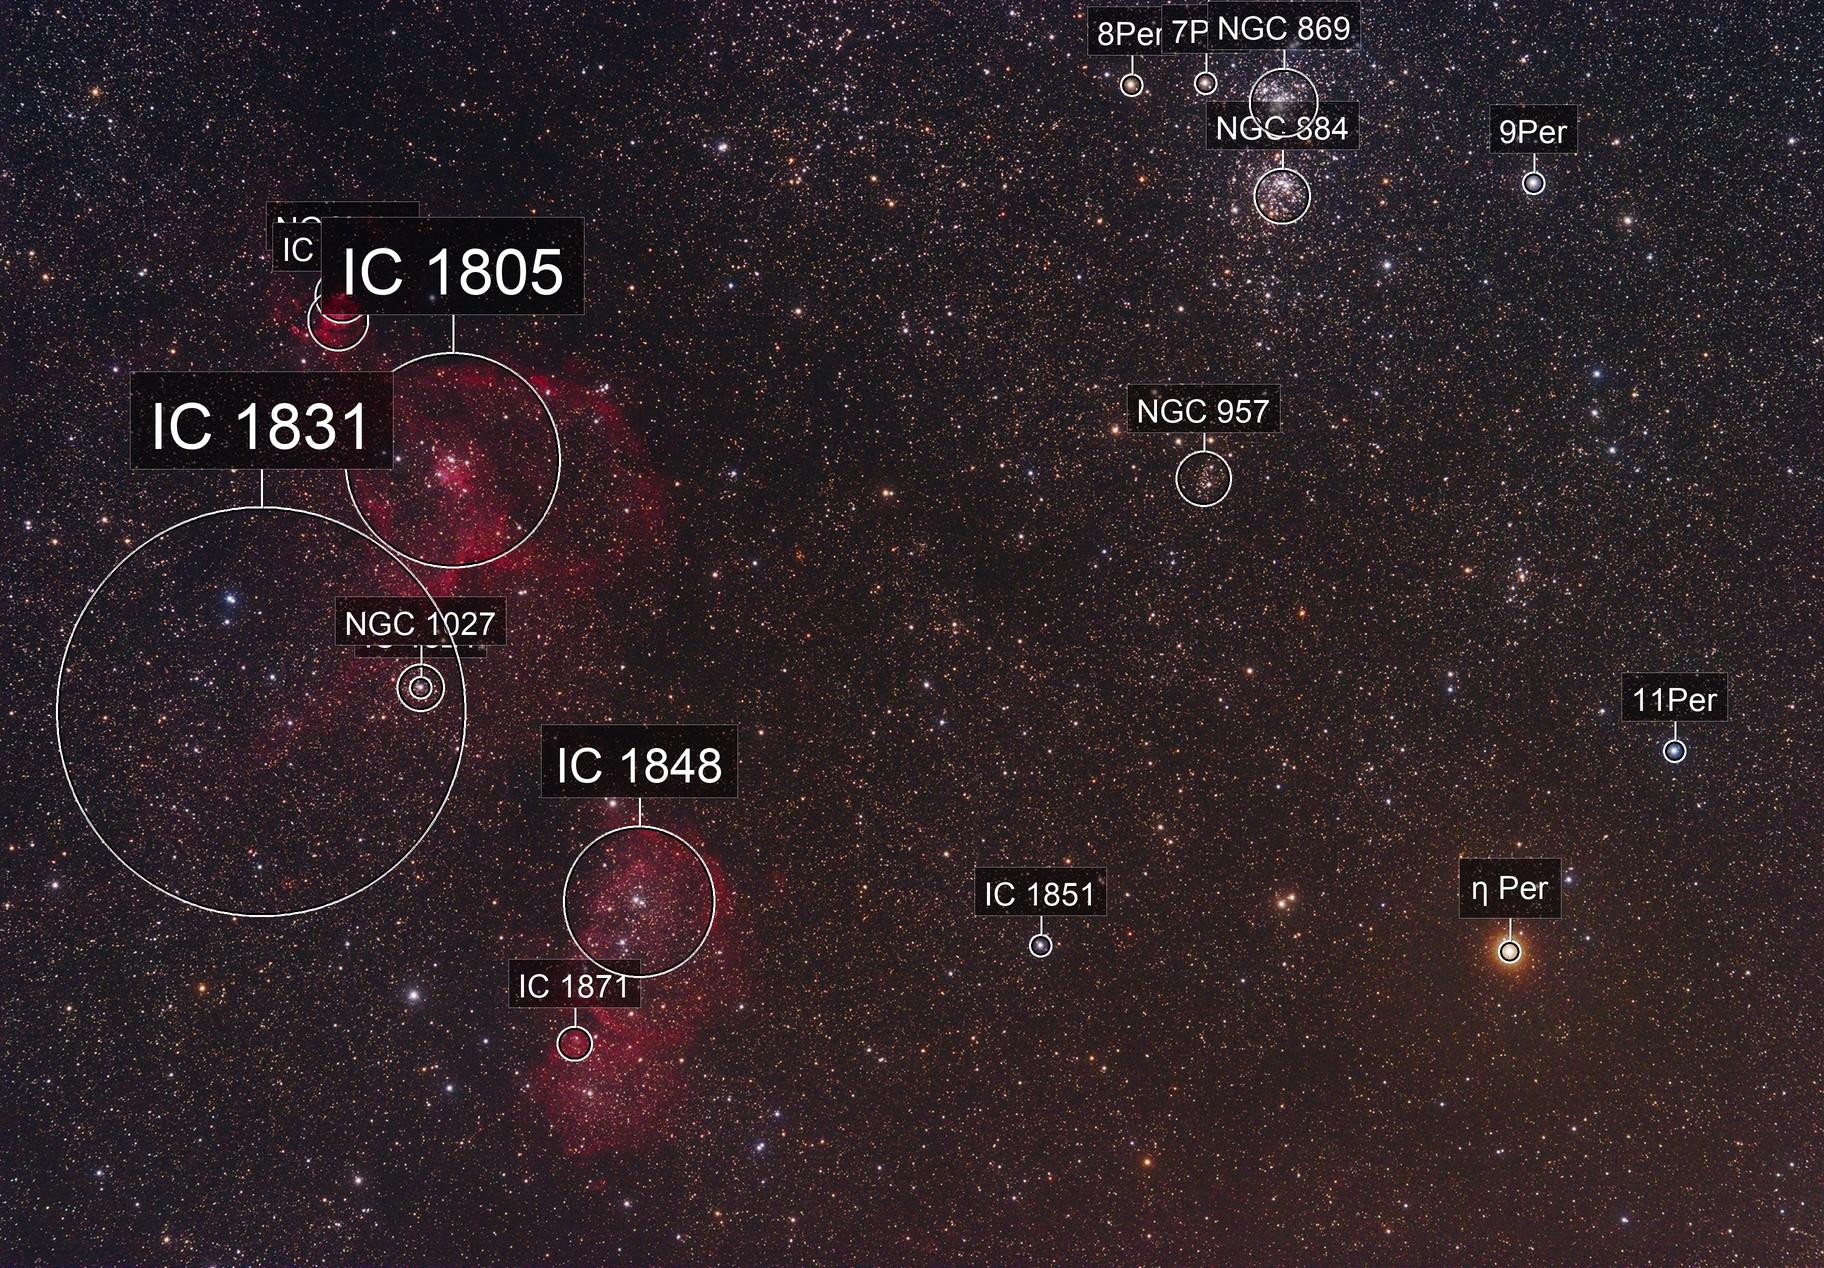 Heart Nebula, Soul Nebula, and Double Cluster